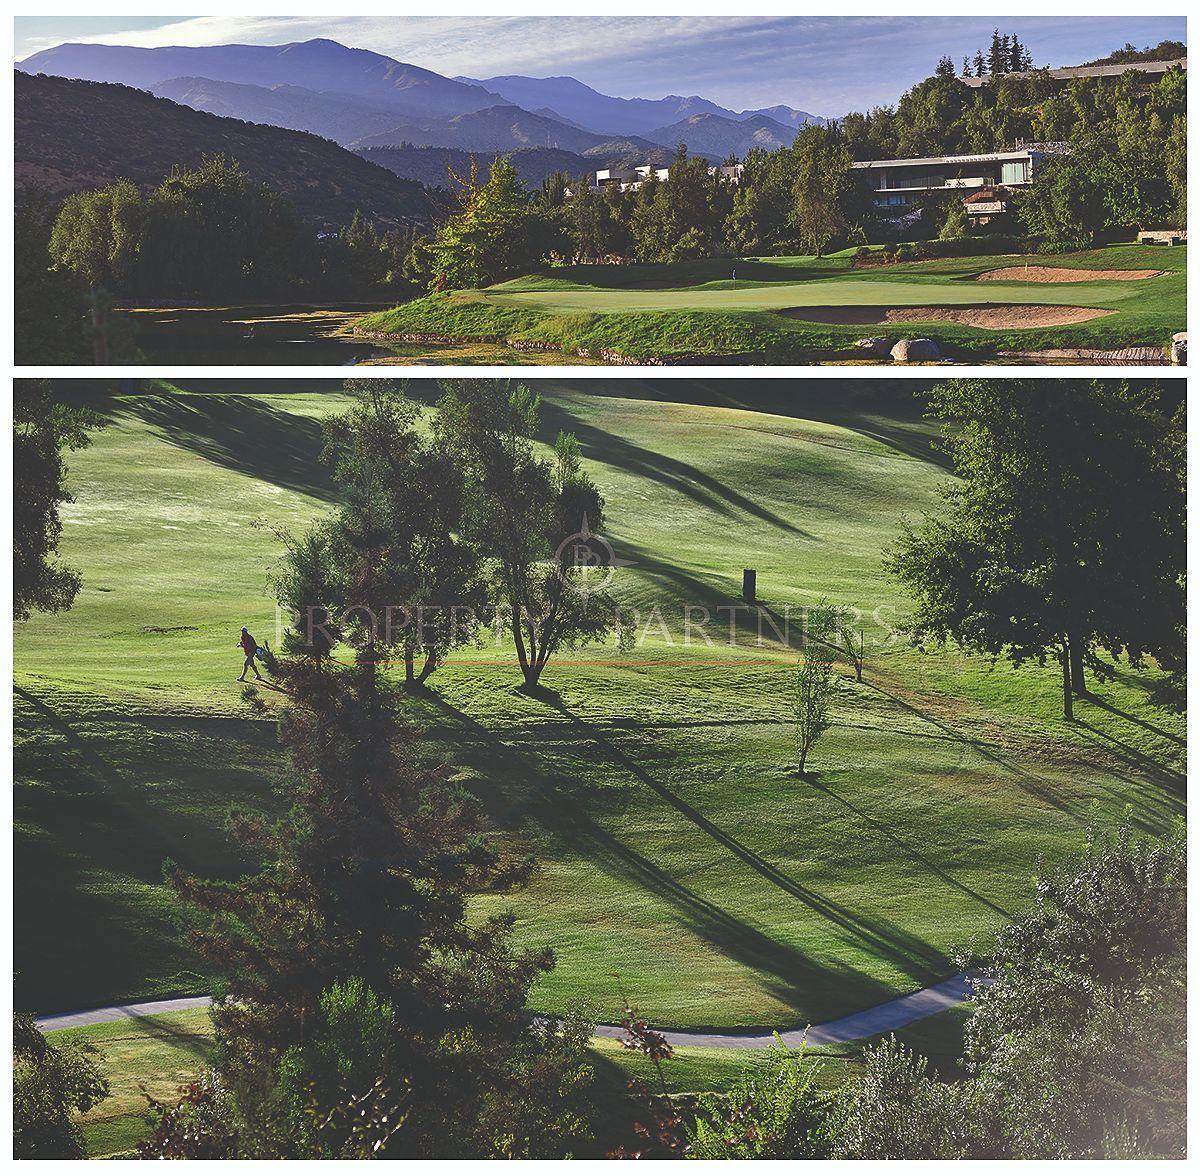 5 de 6: Cancha de Golf de nueve hoyos